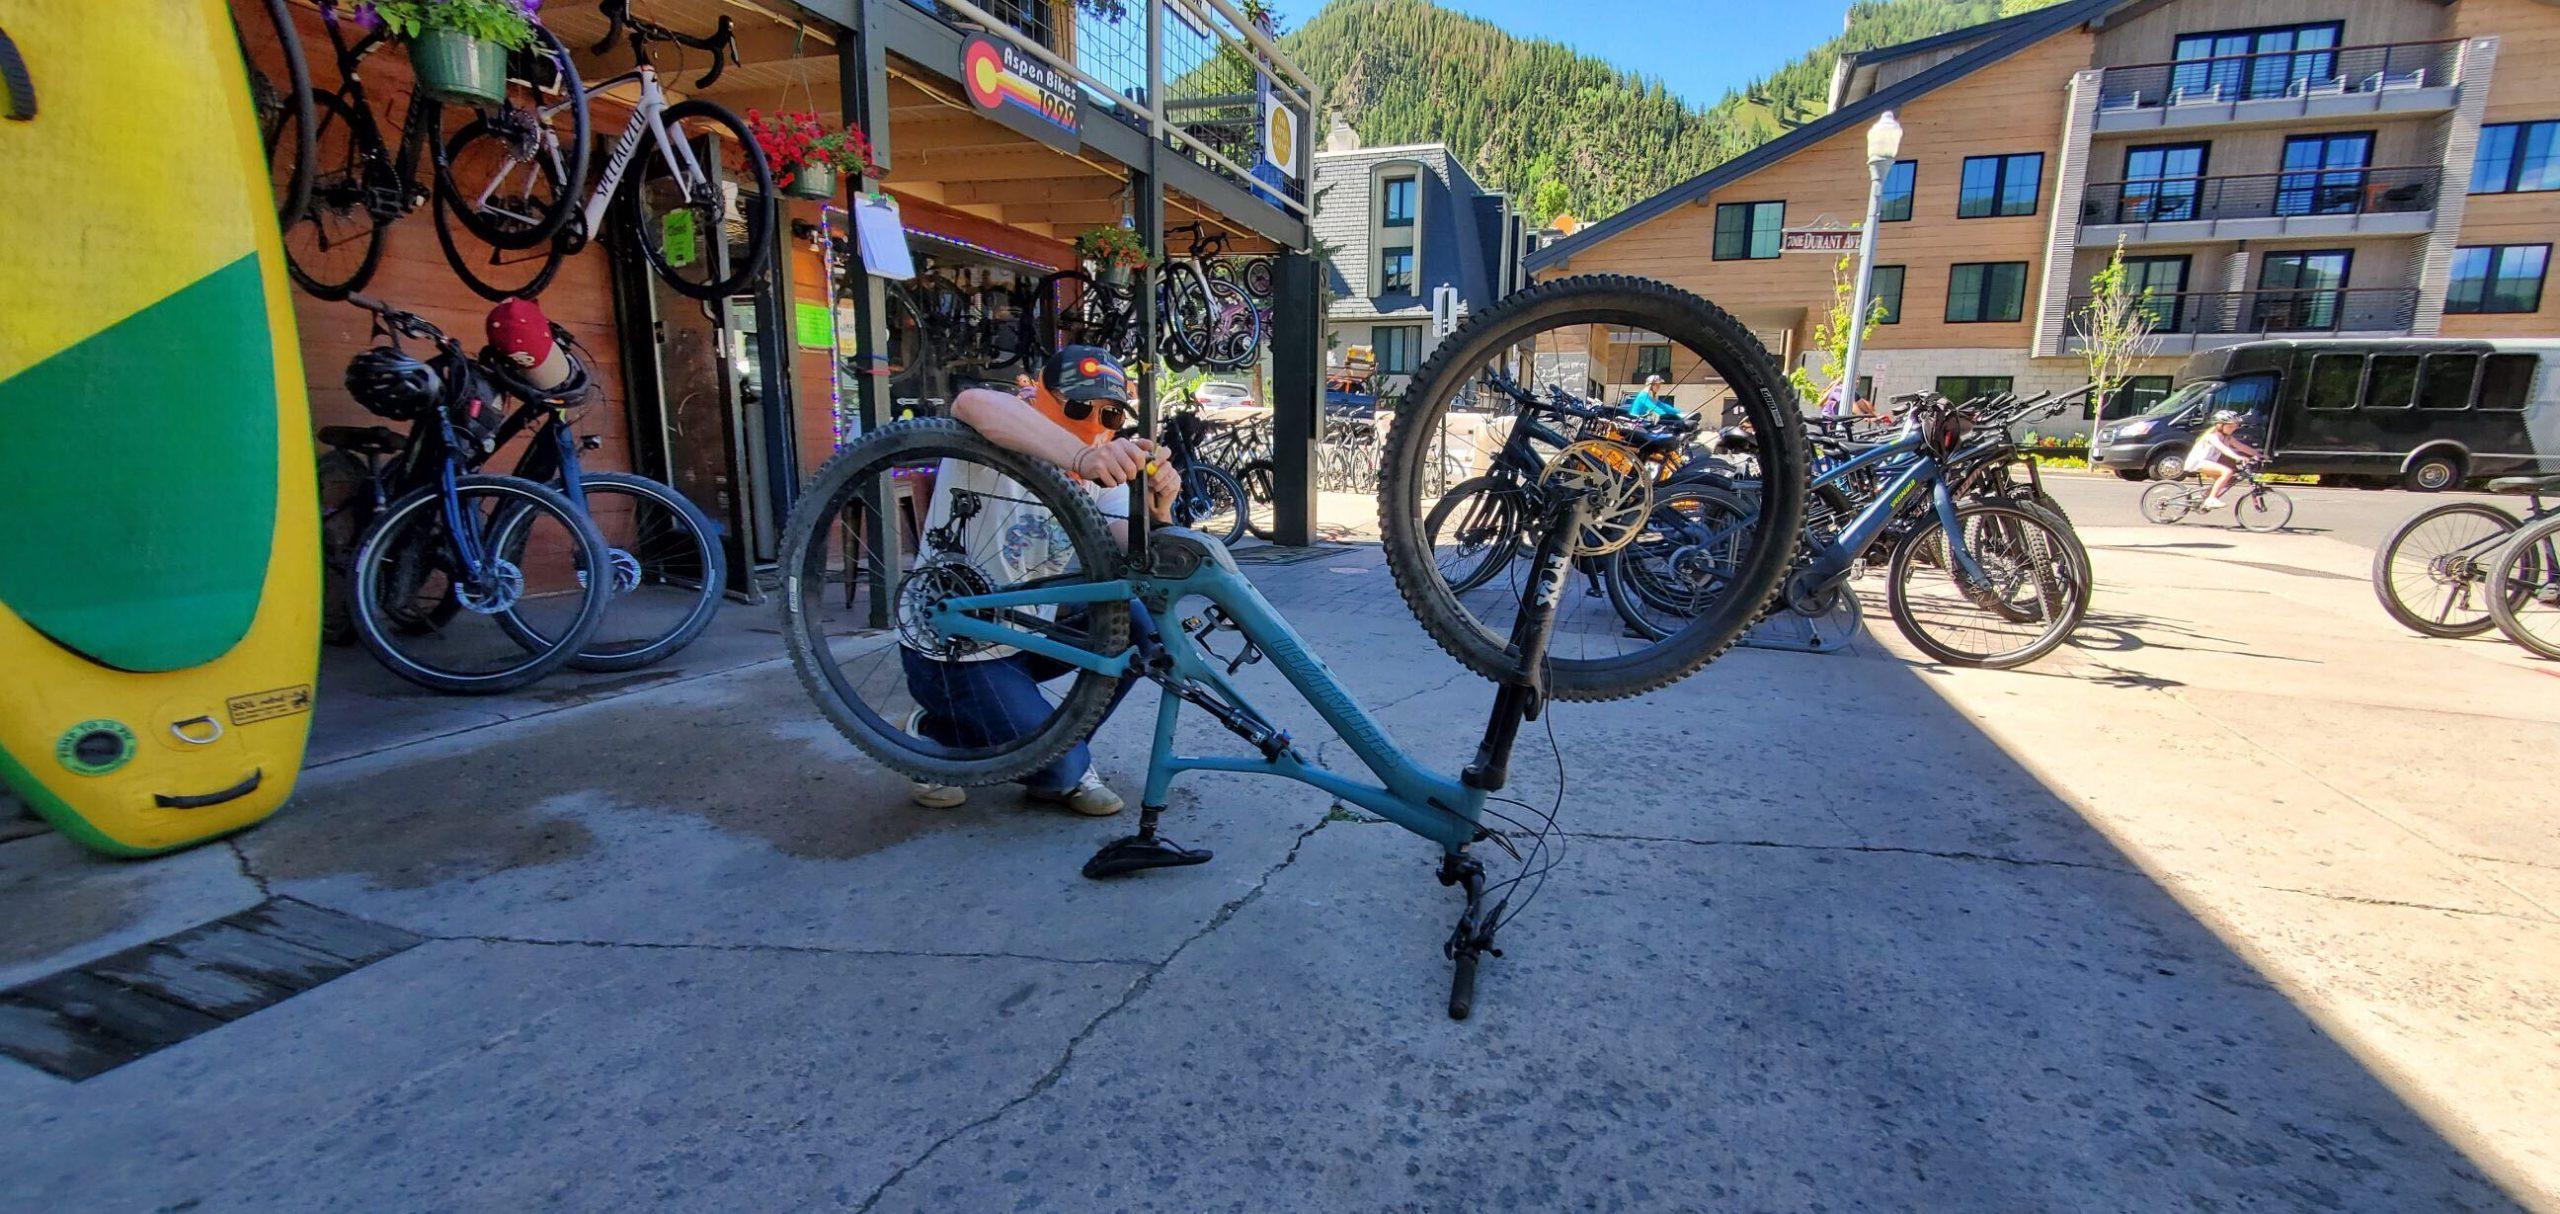 Blake Linehan puts pedals on a bike while working as a bike technician at Stapleton Ski/Aspen Bikes in Aspen, Colorado July 7, 2020.